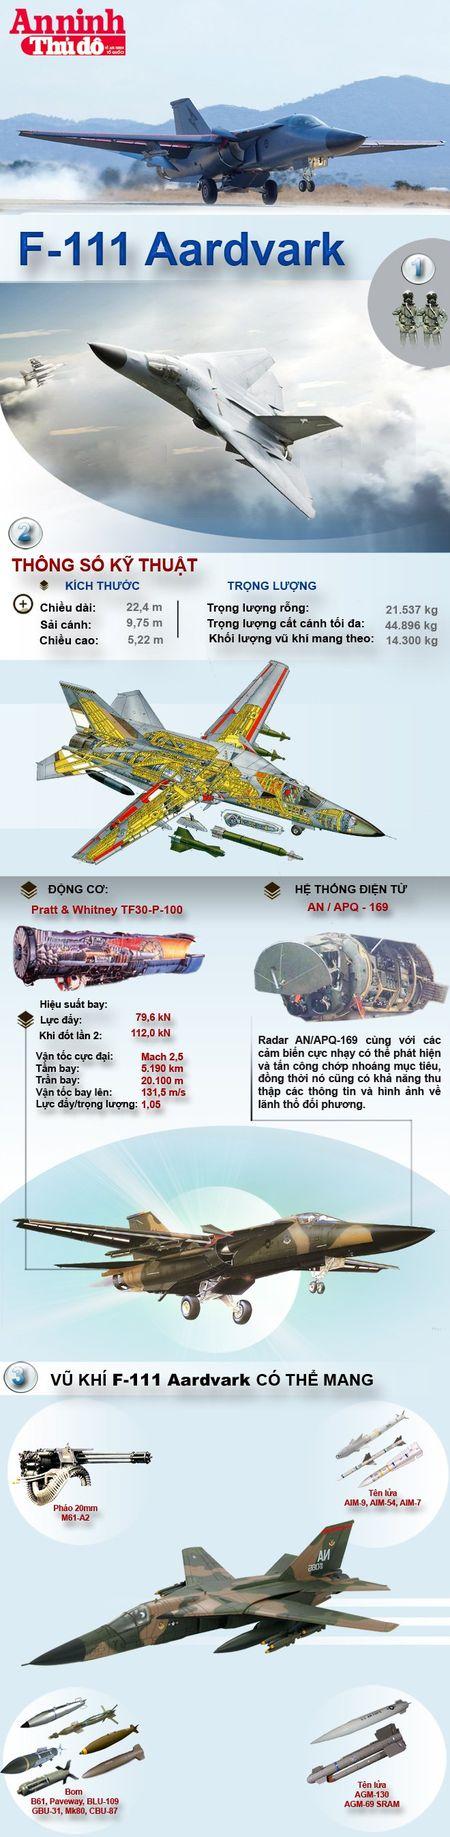 F-111 Aardvark - Chien dau co hien dai nhat cua My trong Chien tranh Viet Nam - Anh 2